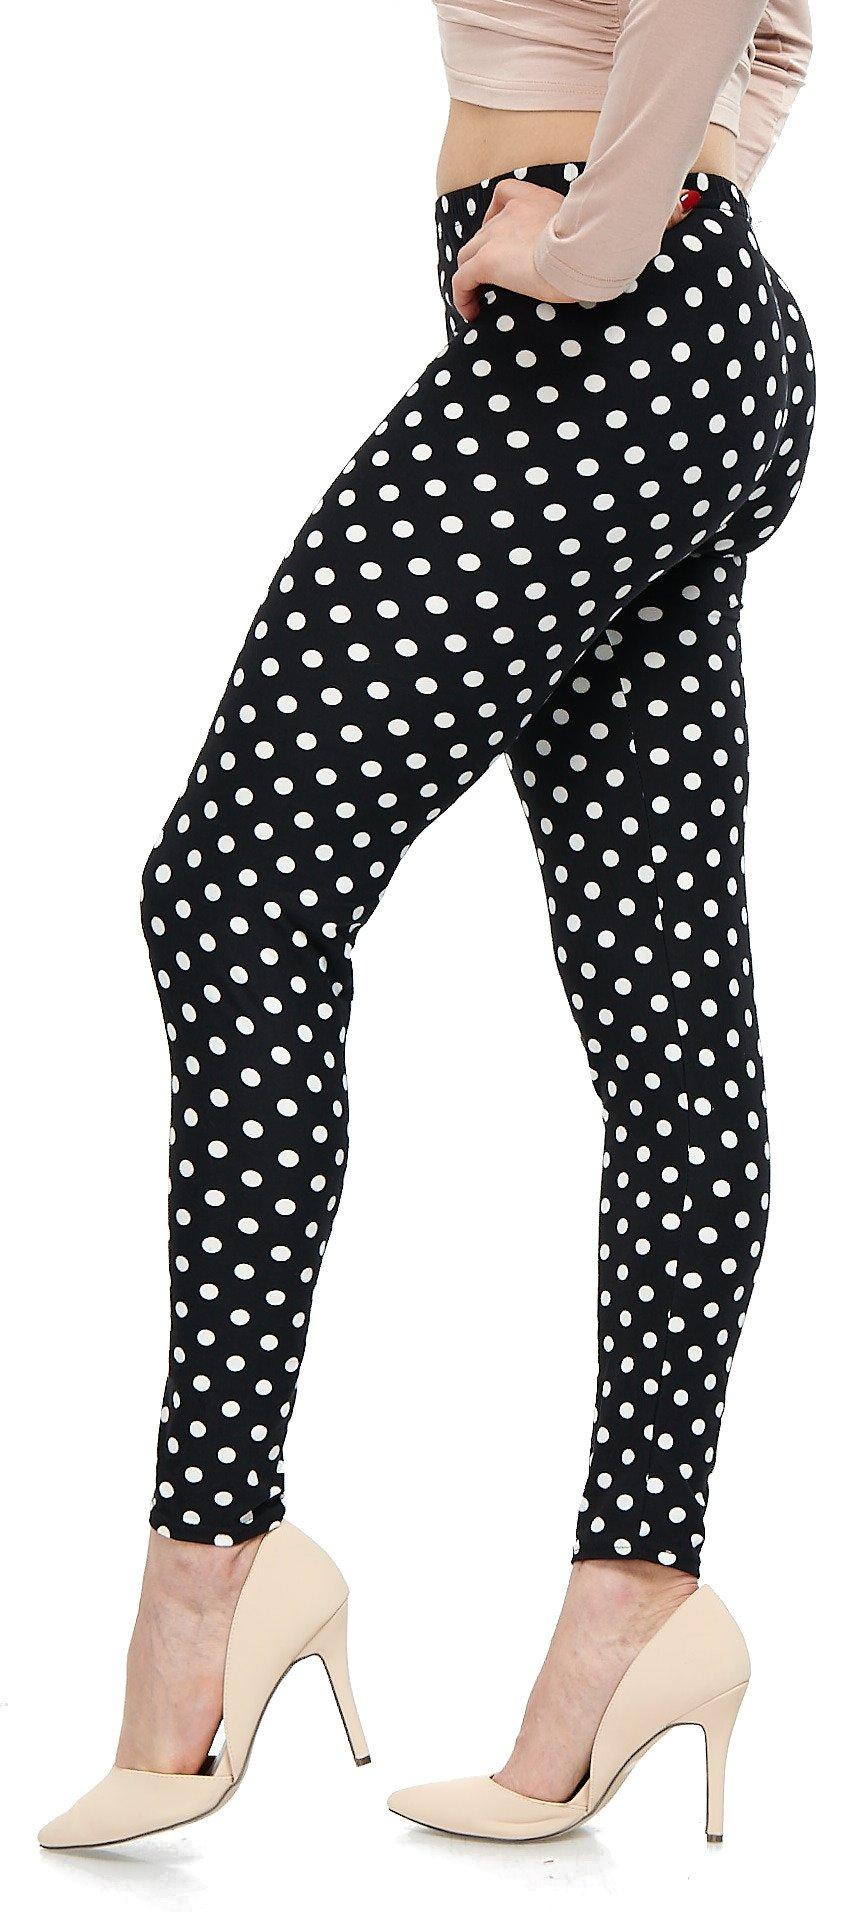 LMB Lush Moda Extra Soft Leggings with Designs- Variety of Prints - 721F Polka Dot B5